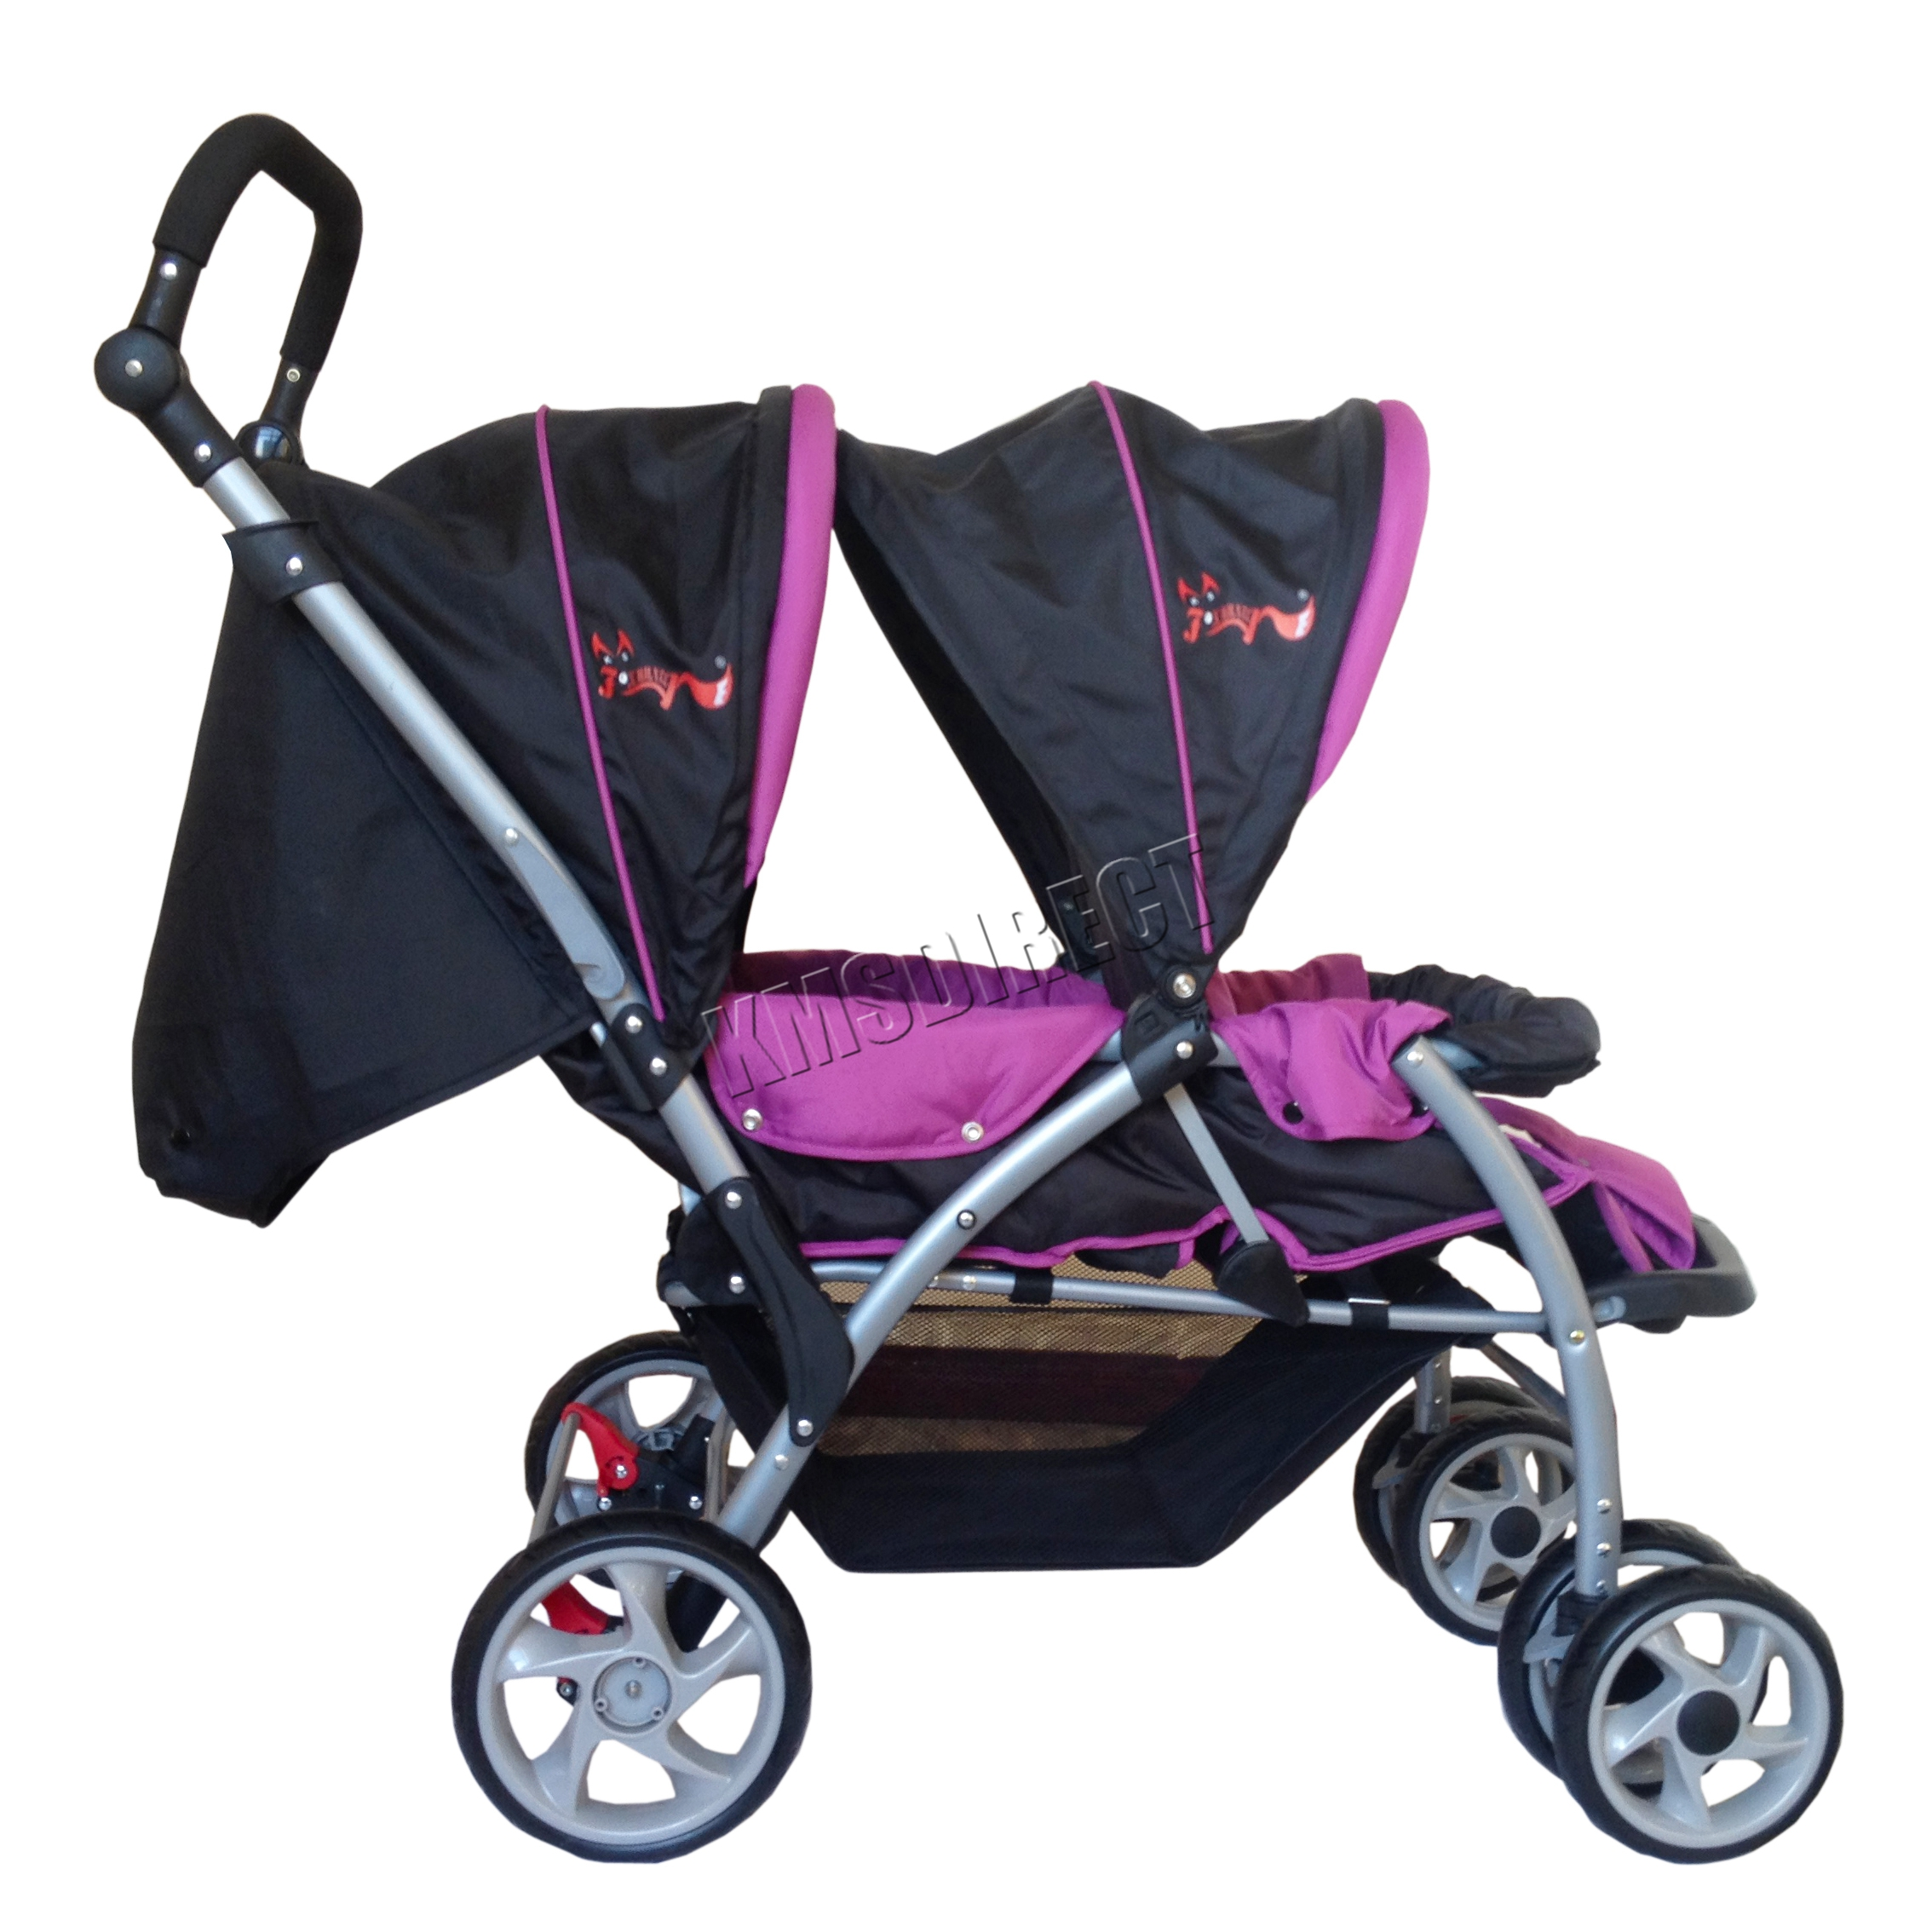 Sentinel FoxHunter Baby Tandem Double Stroller Twin Pushchair Pram Buggy Travel Purple